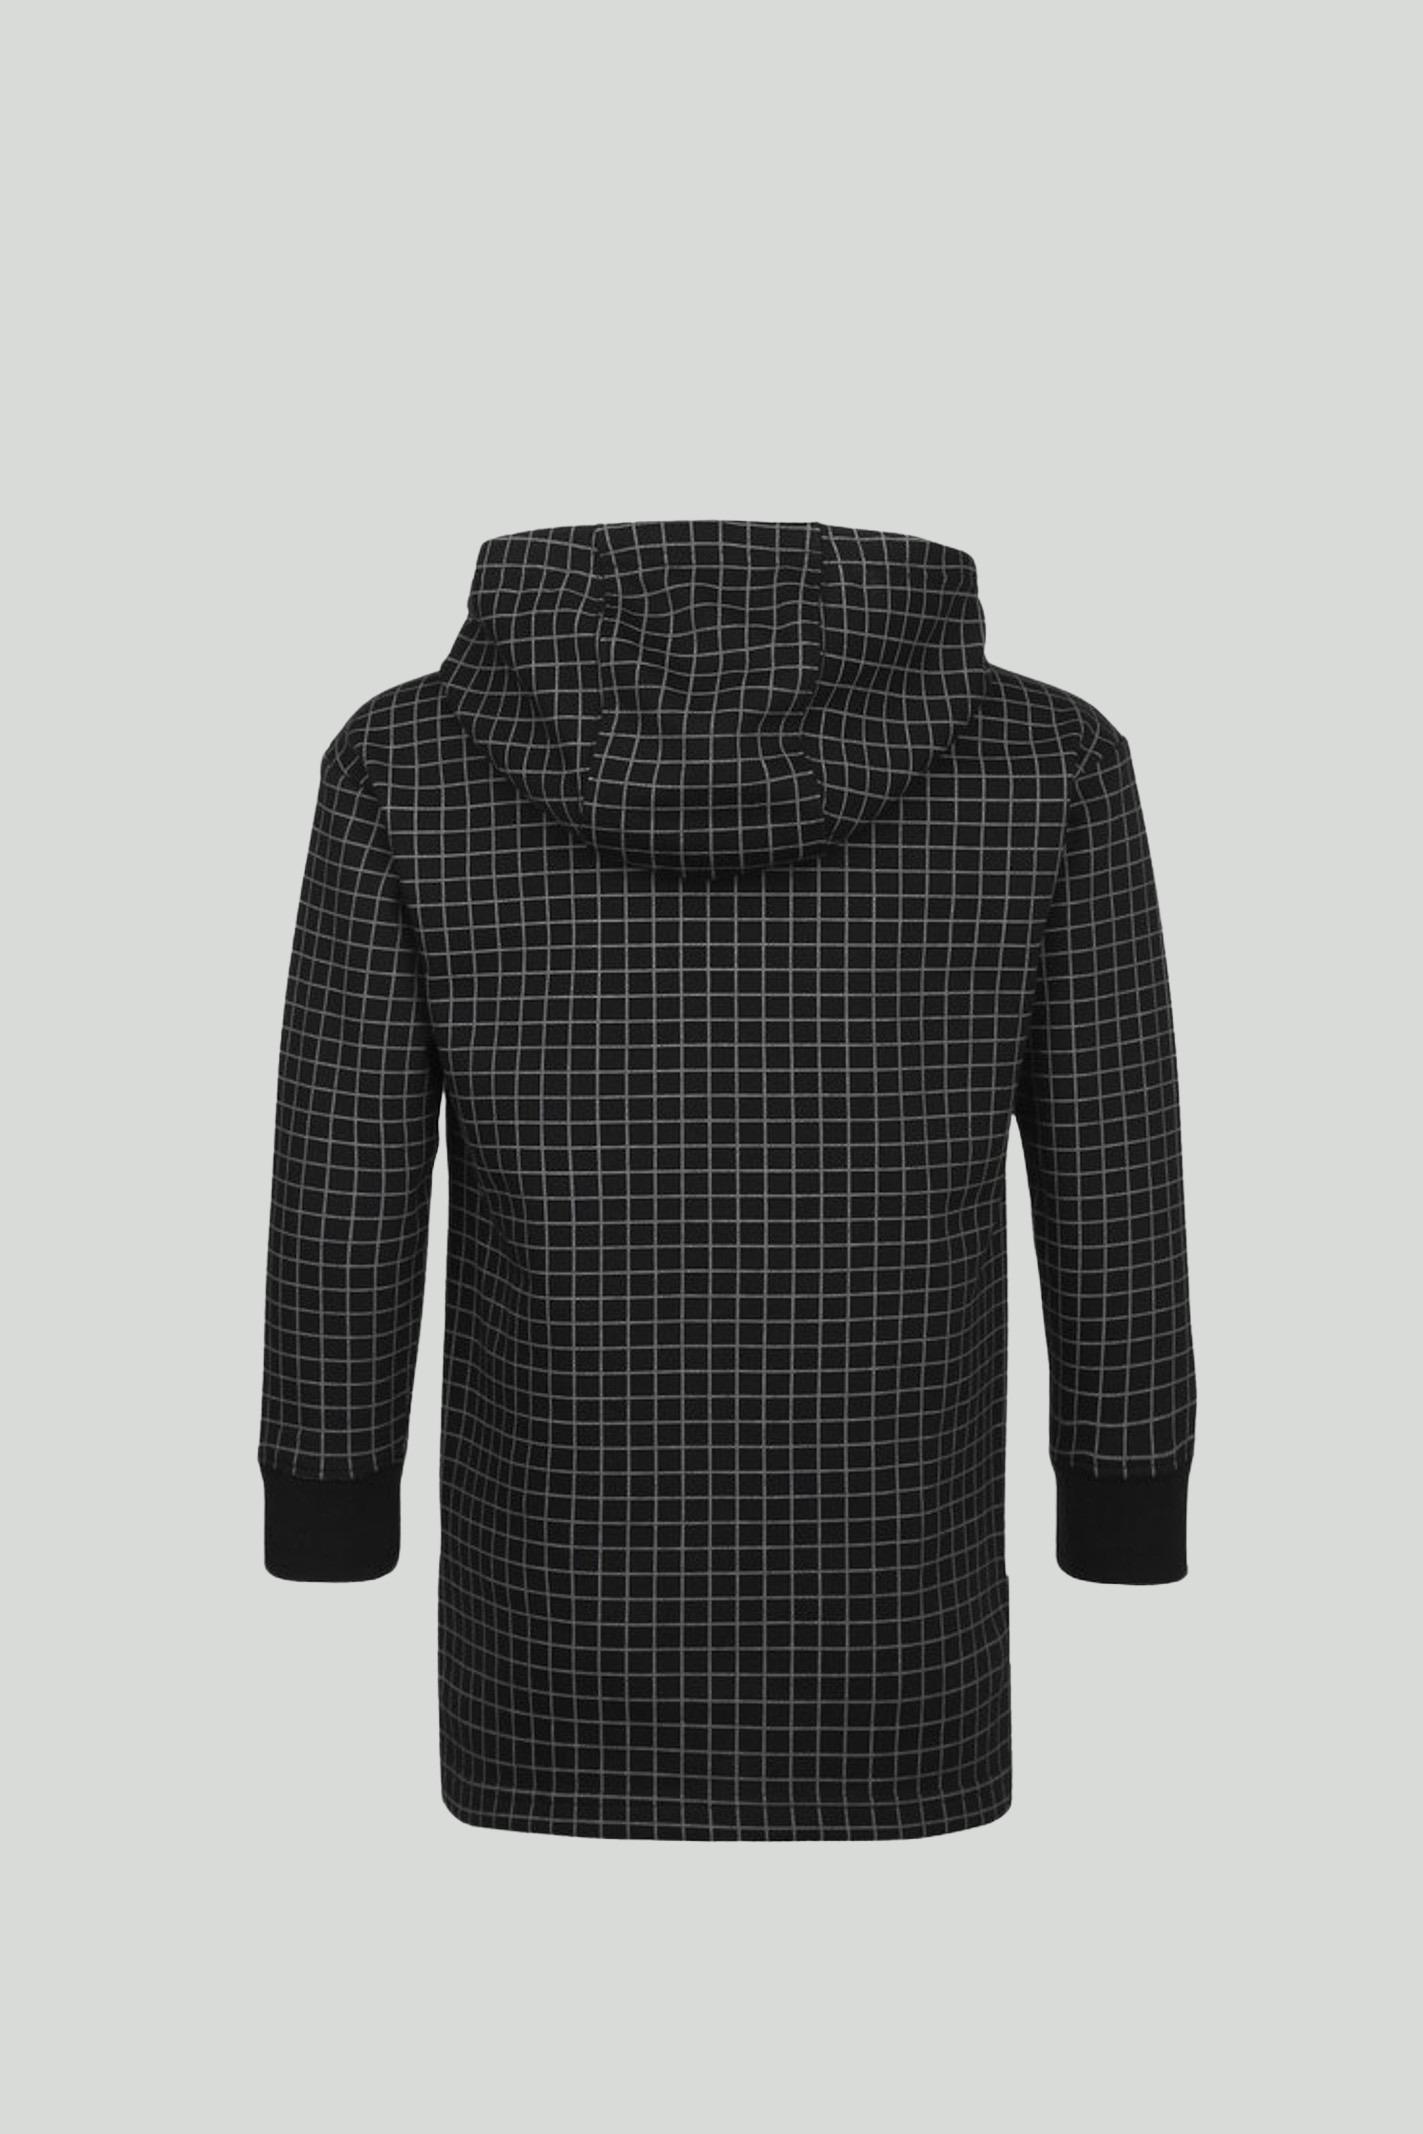 Black fleece hoodie with contrasting logo on the front. Baby model. Brand: Nike NIKE | Sweatshirt | DA0755010